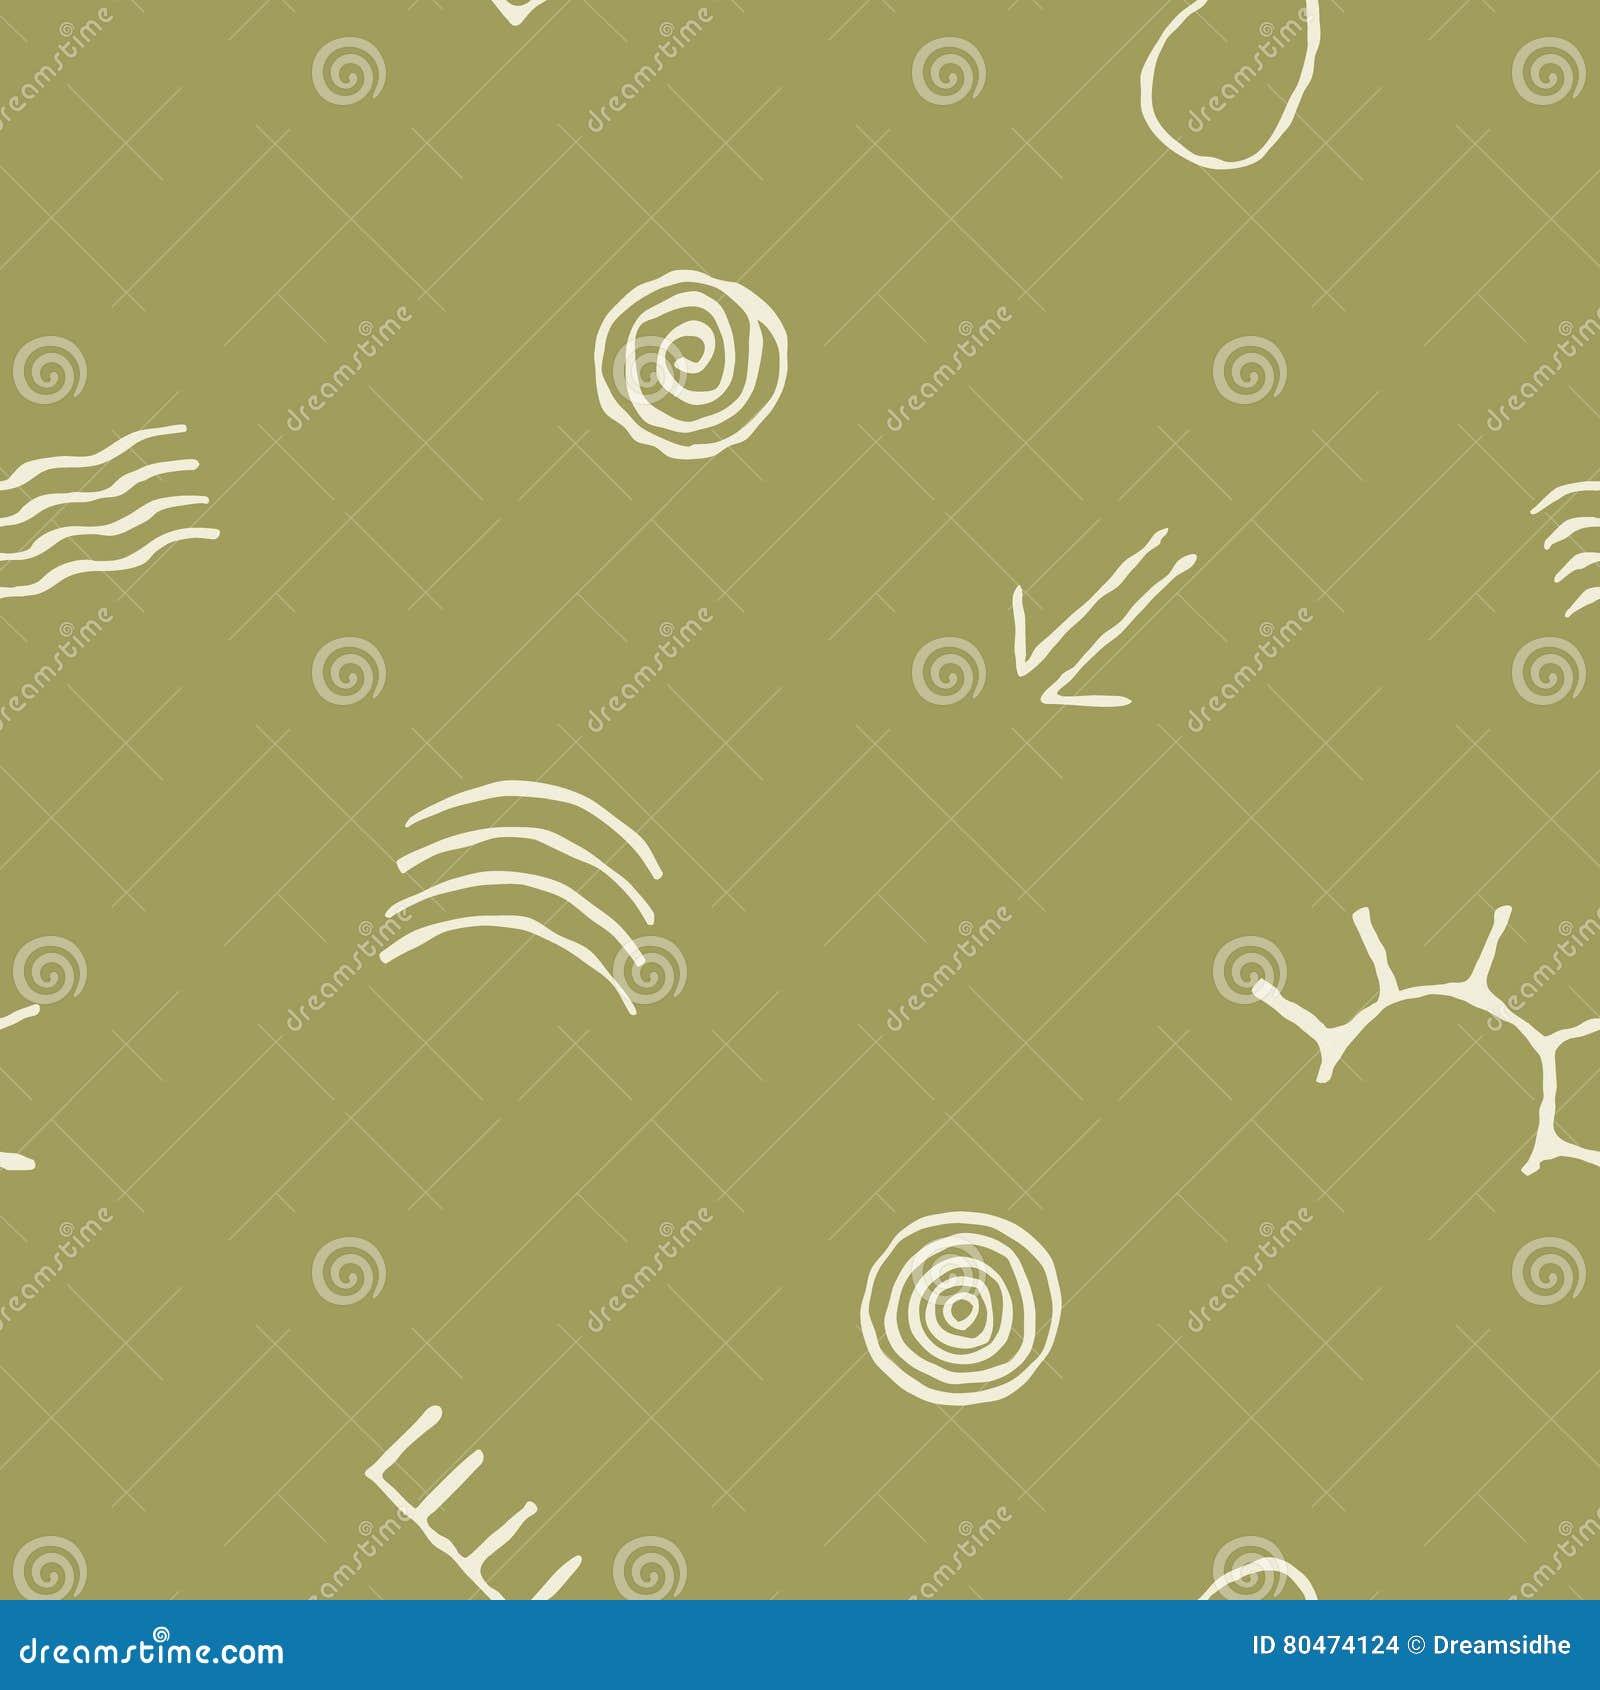 Seamless Pattern With Symbols Of Australian Aboriginal Art Stock